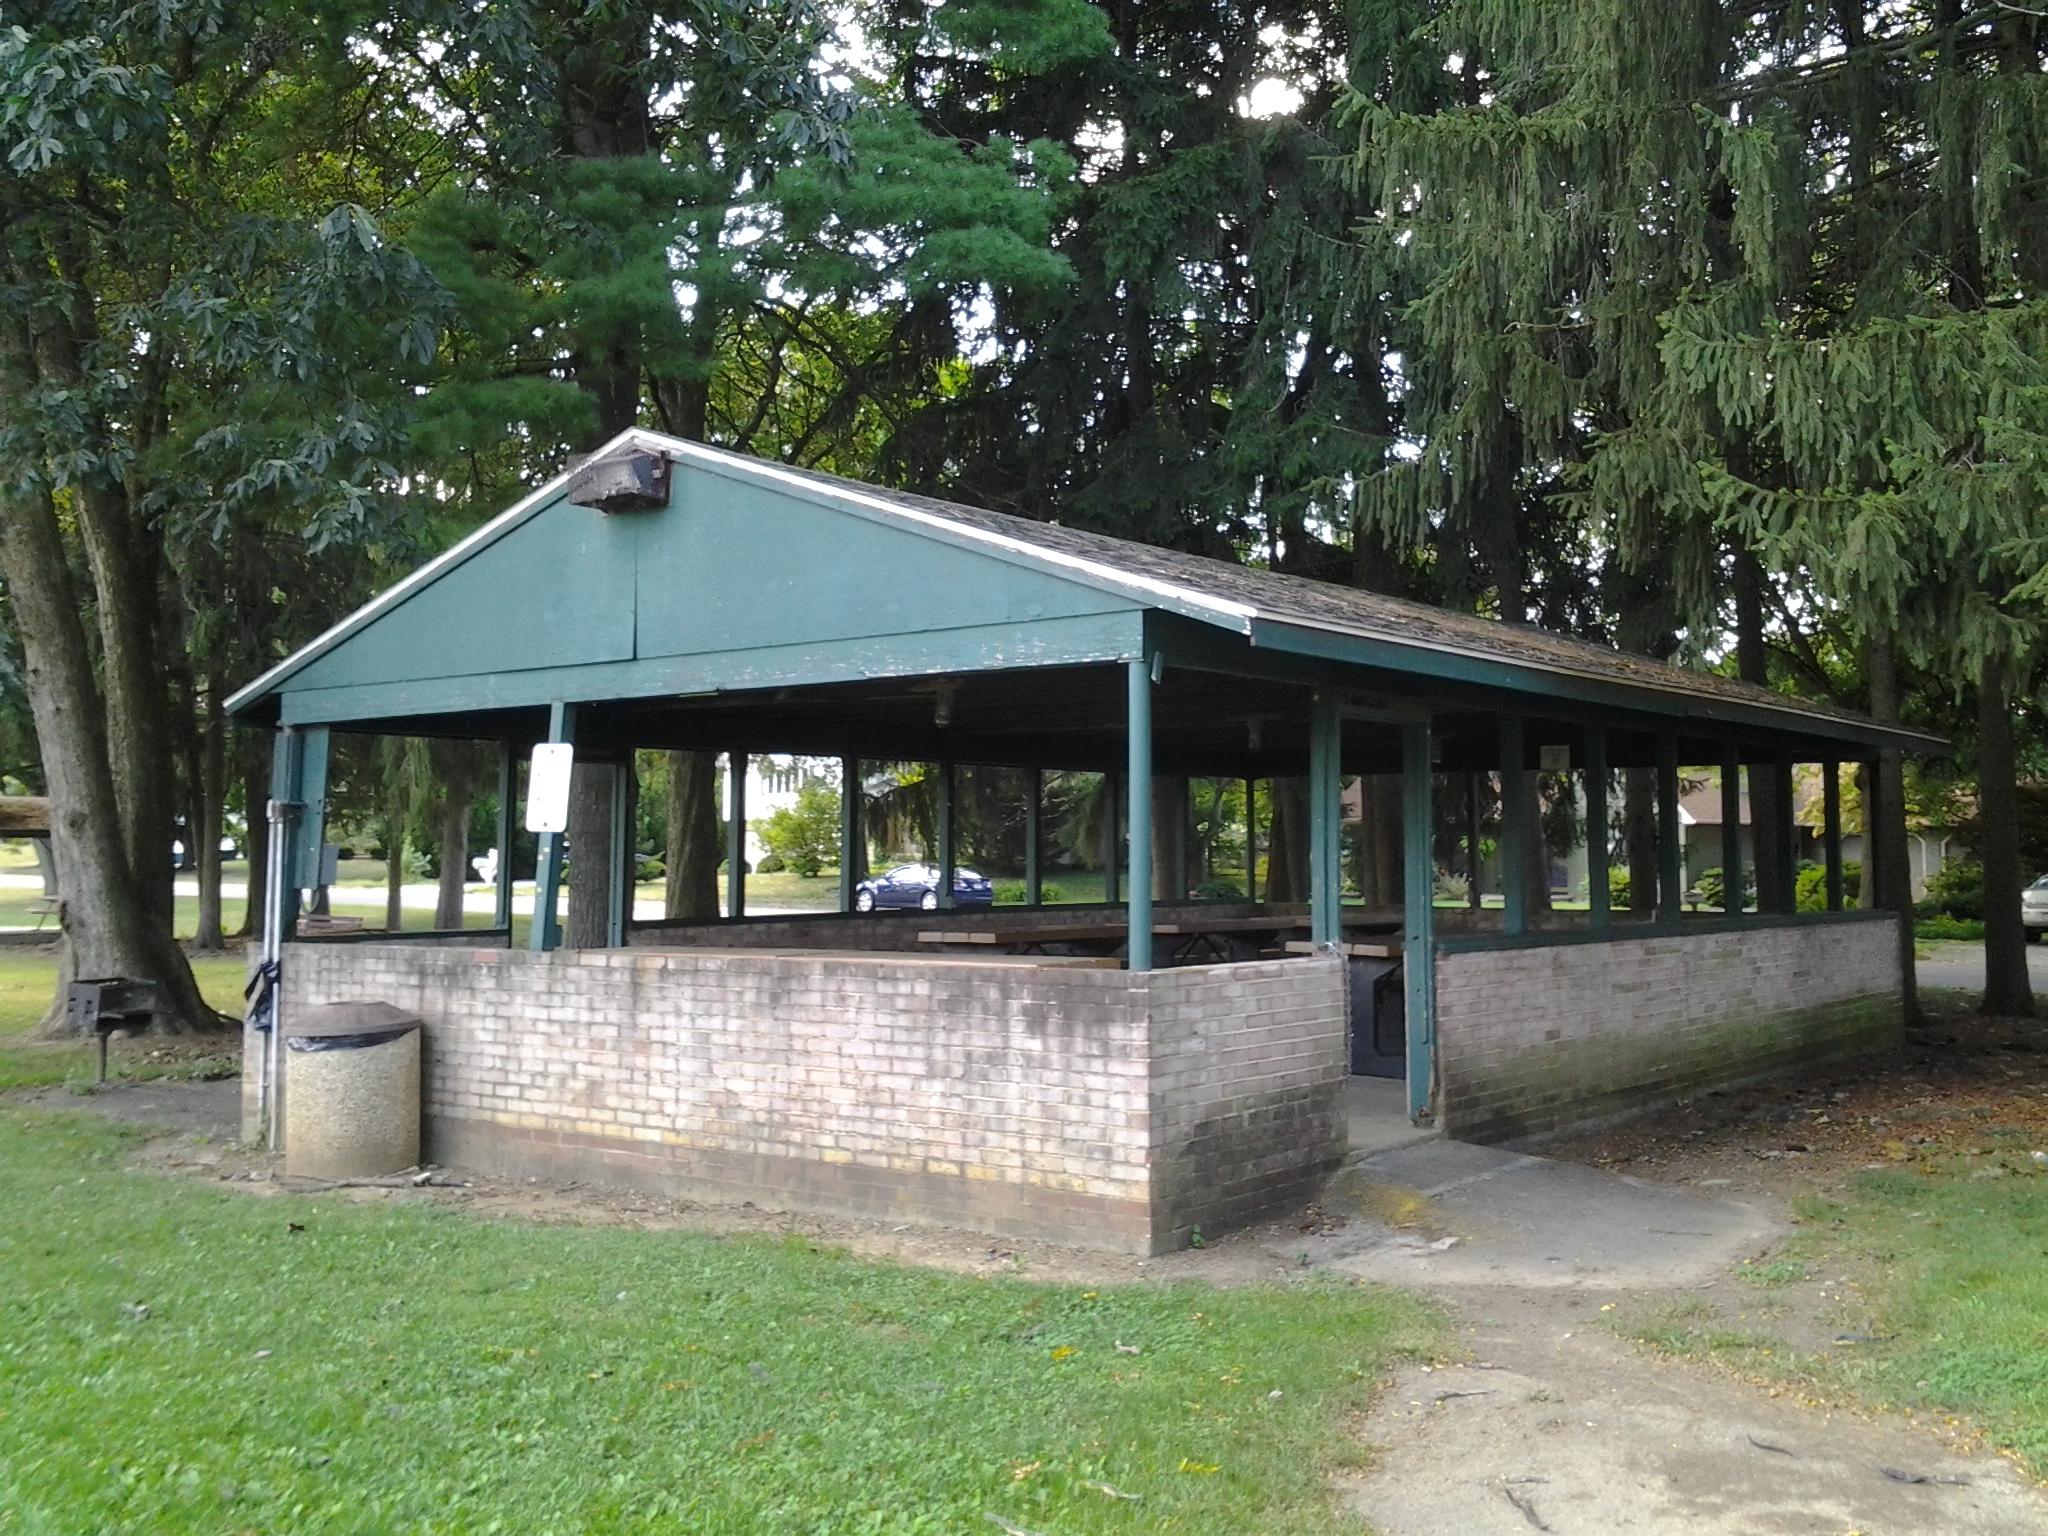 Park Place Pavilion $55 Weekends, $25 Weekdays